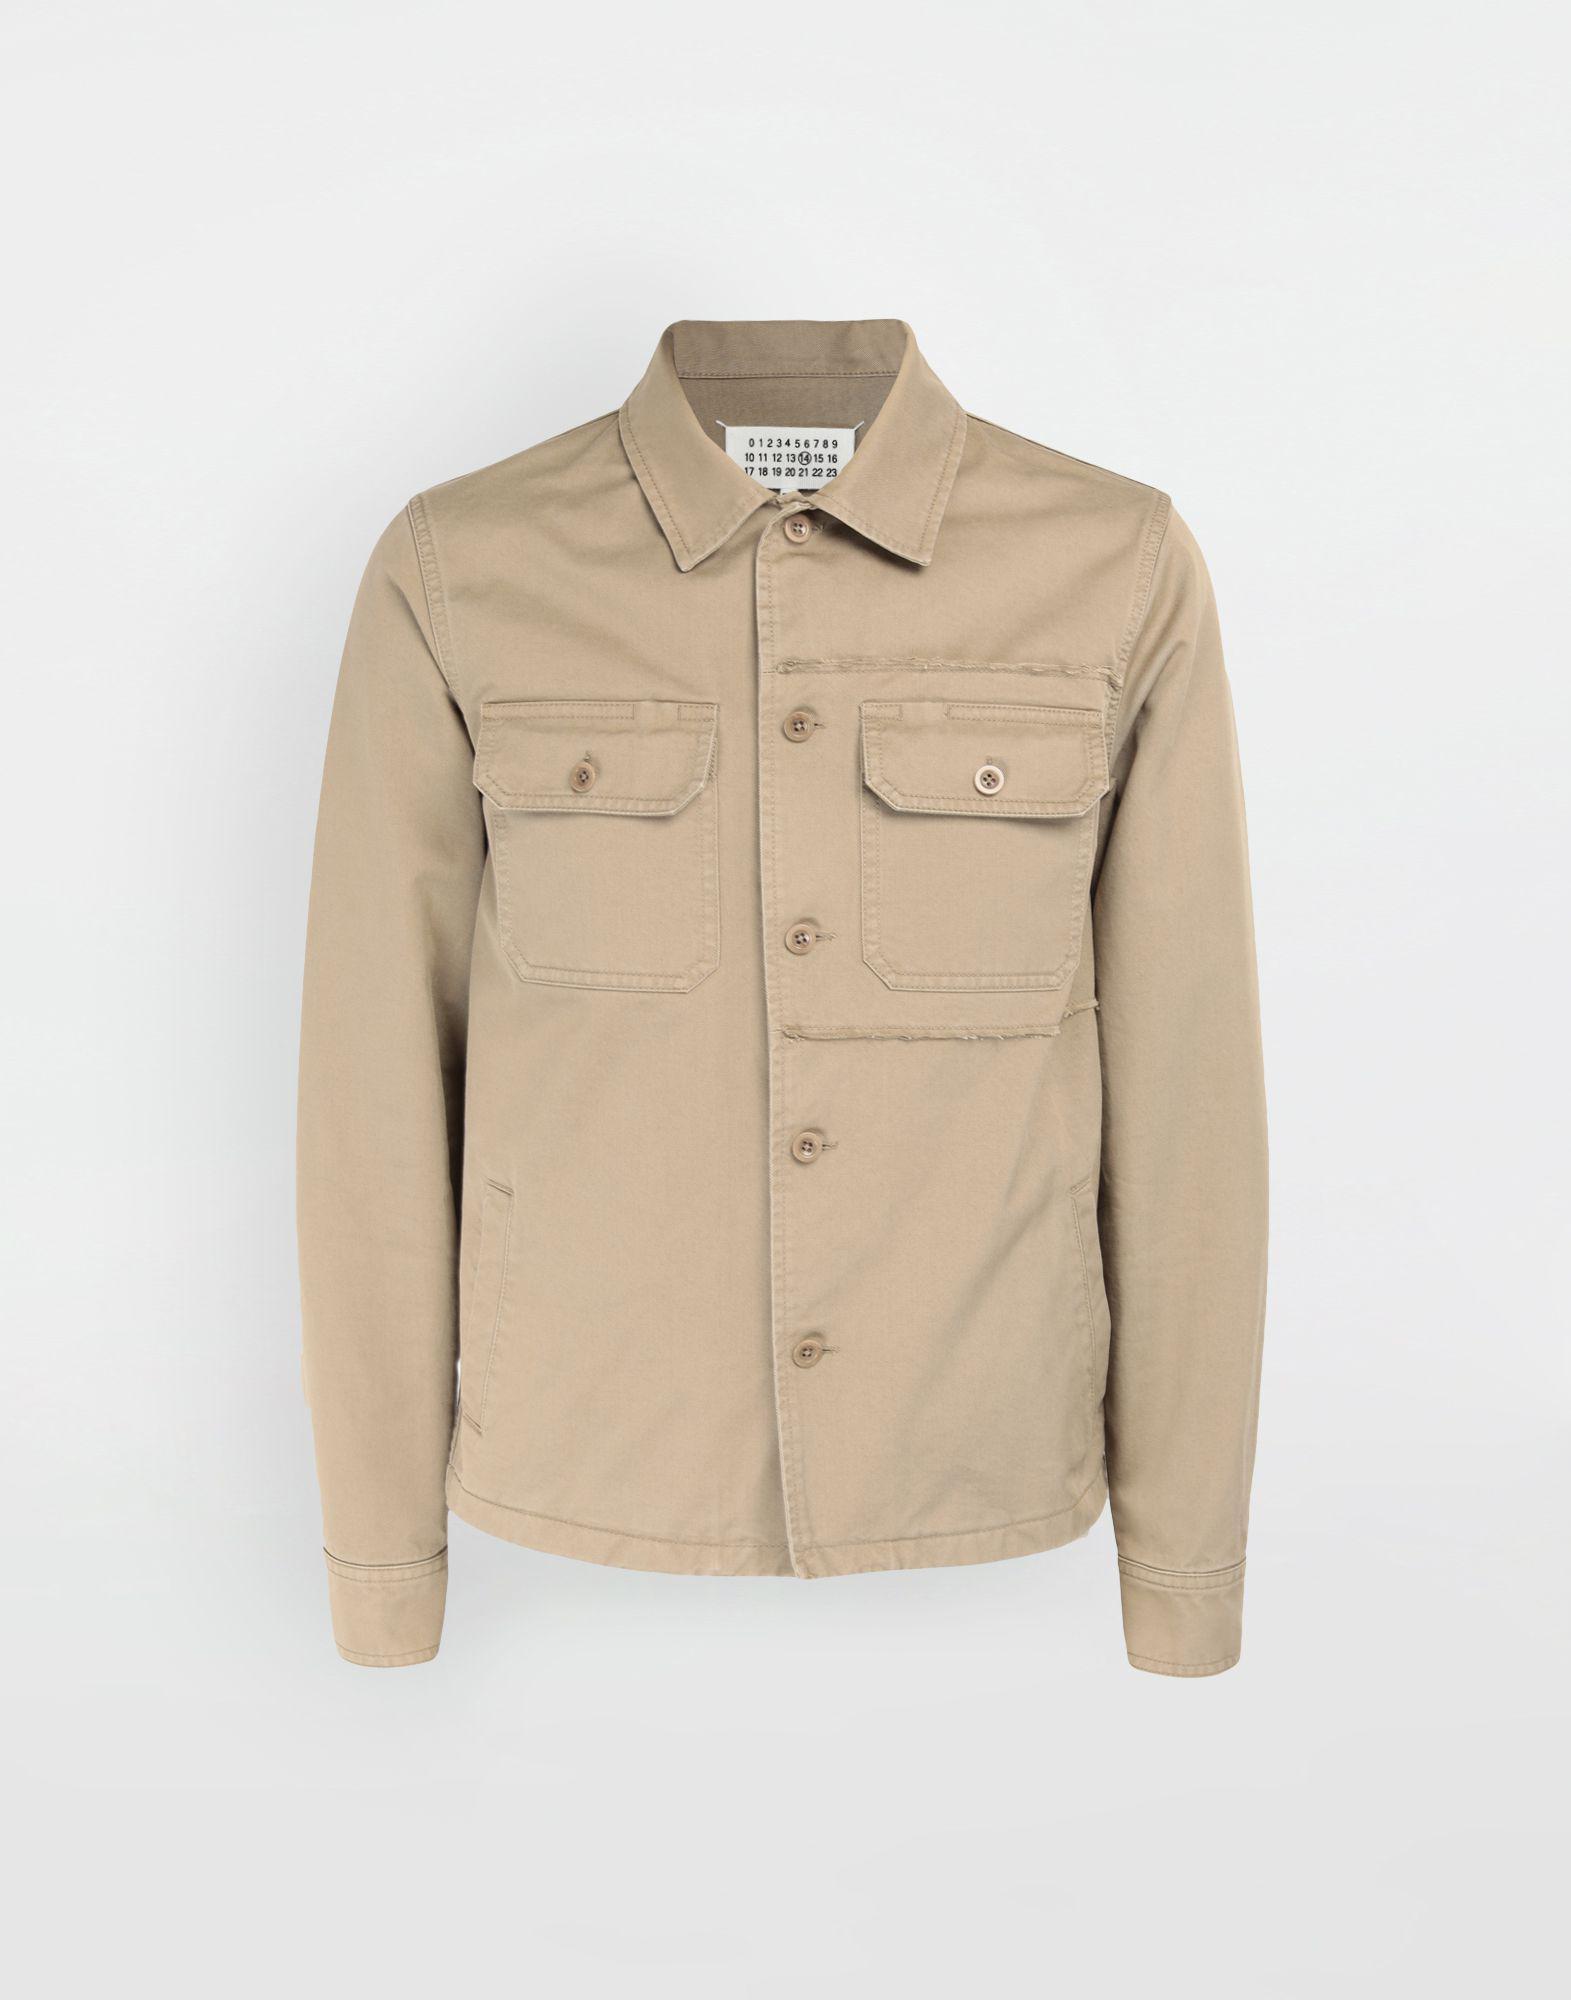 Maison In Shrunken Natural Gabardine Margiela Lyst Shirt Military dxqfadY7